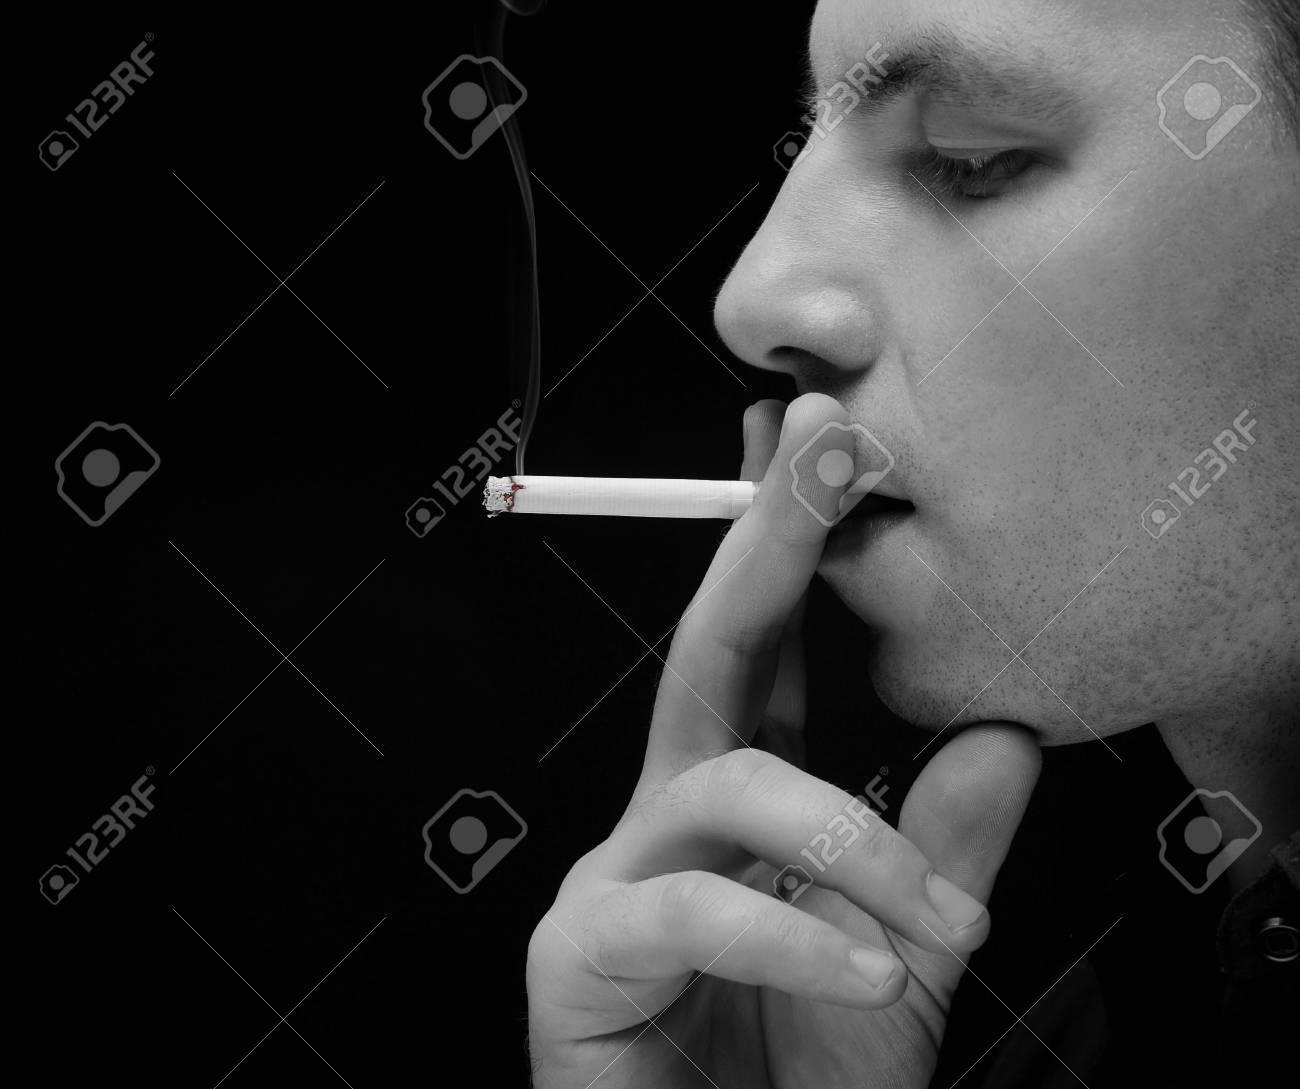 young man smokes a cigarette Stock Photo - 8182033